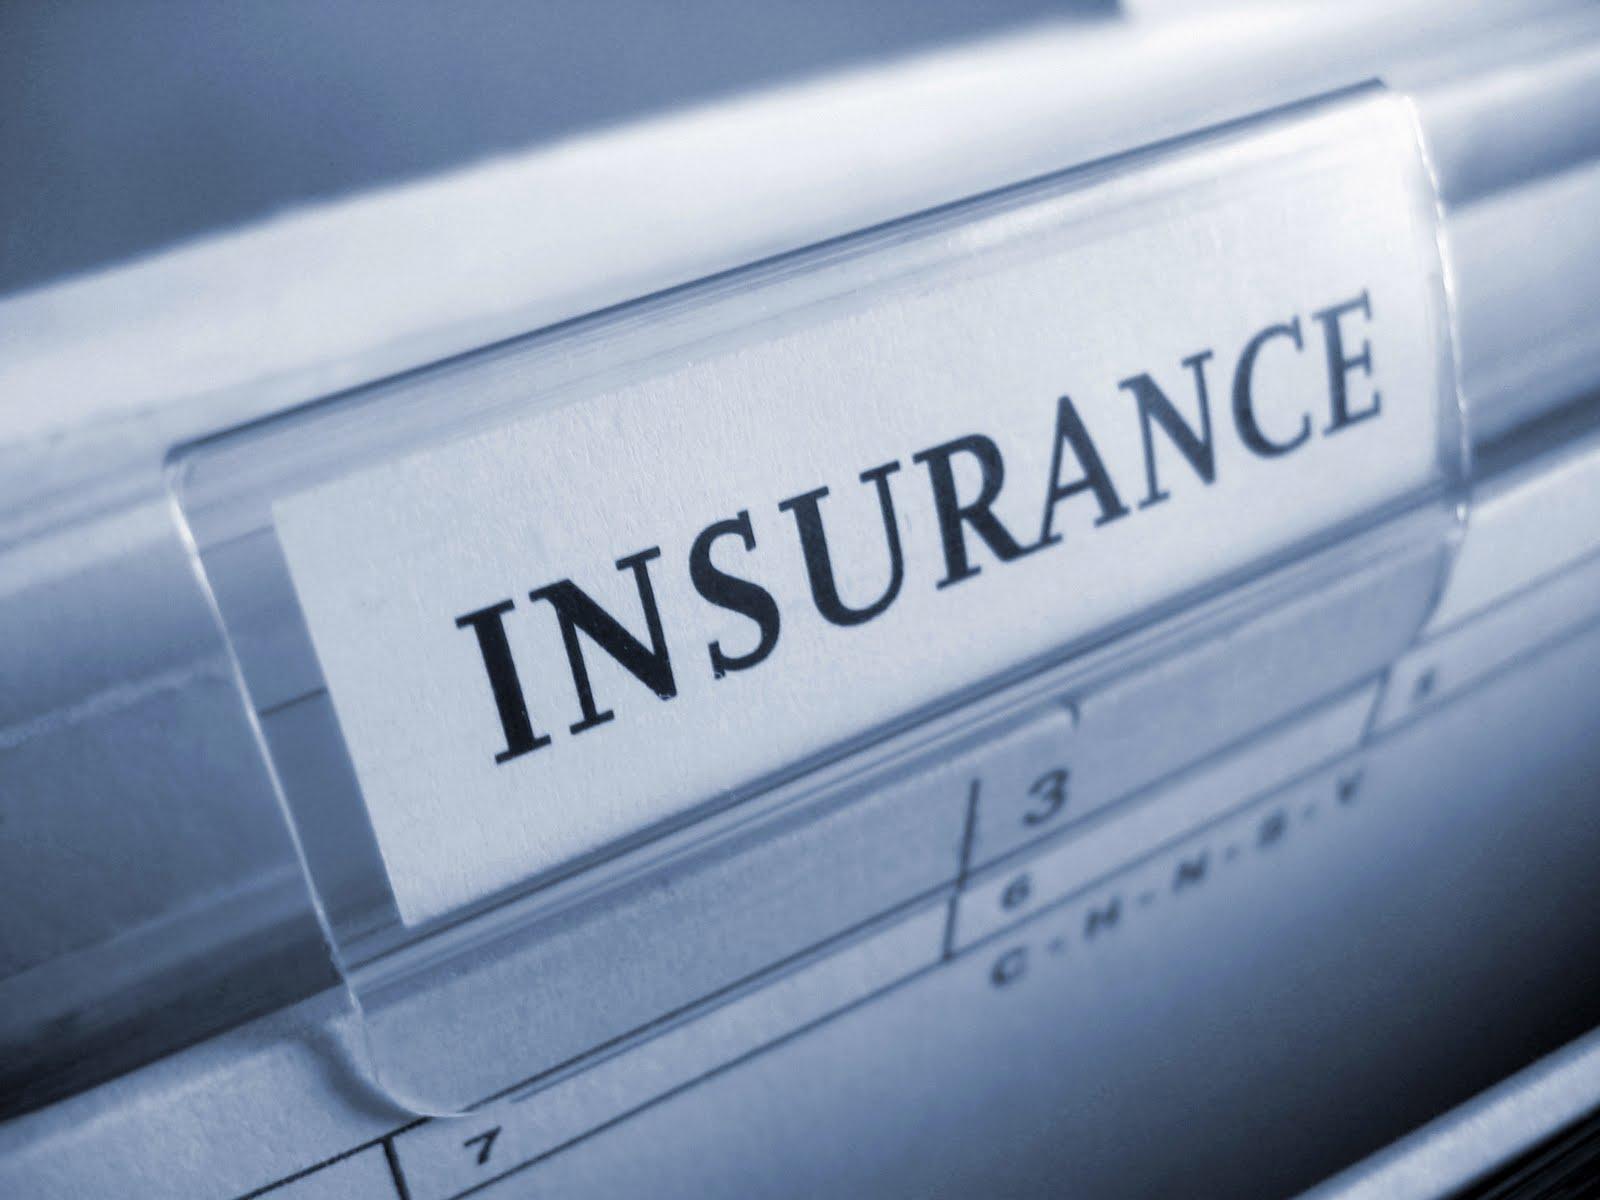 Life Insurance Corporation (Lanka) Ltd